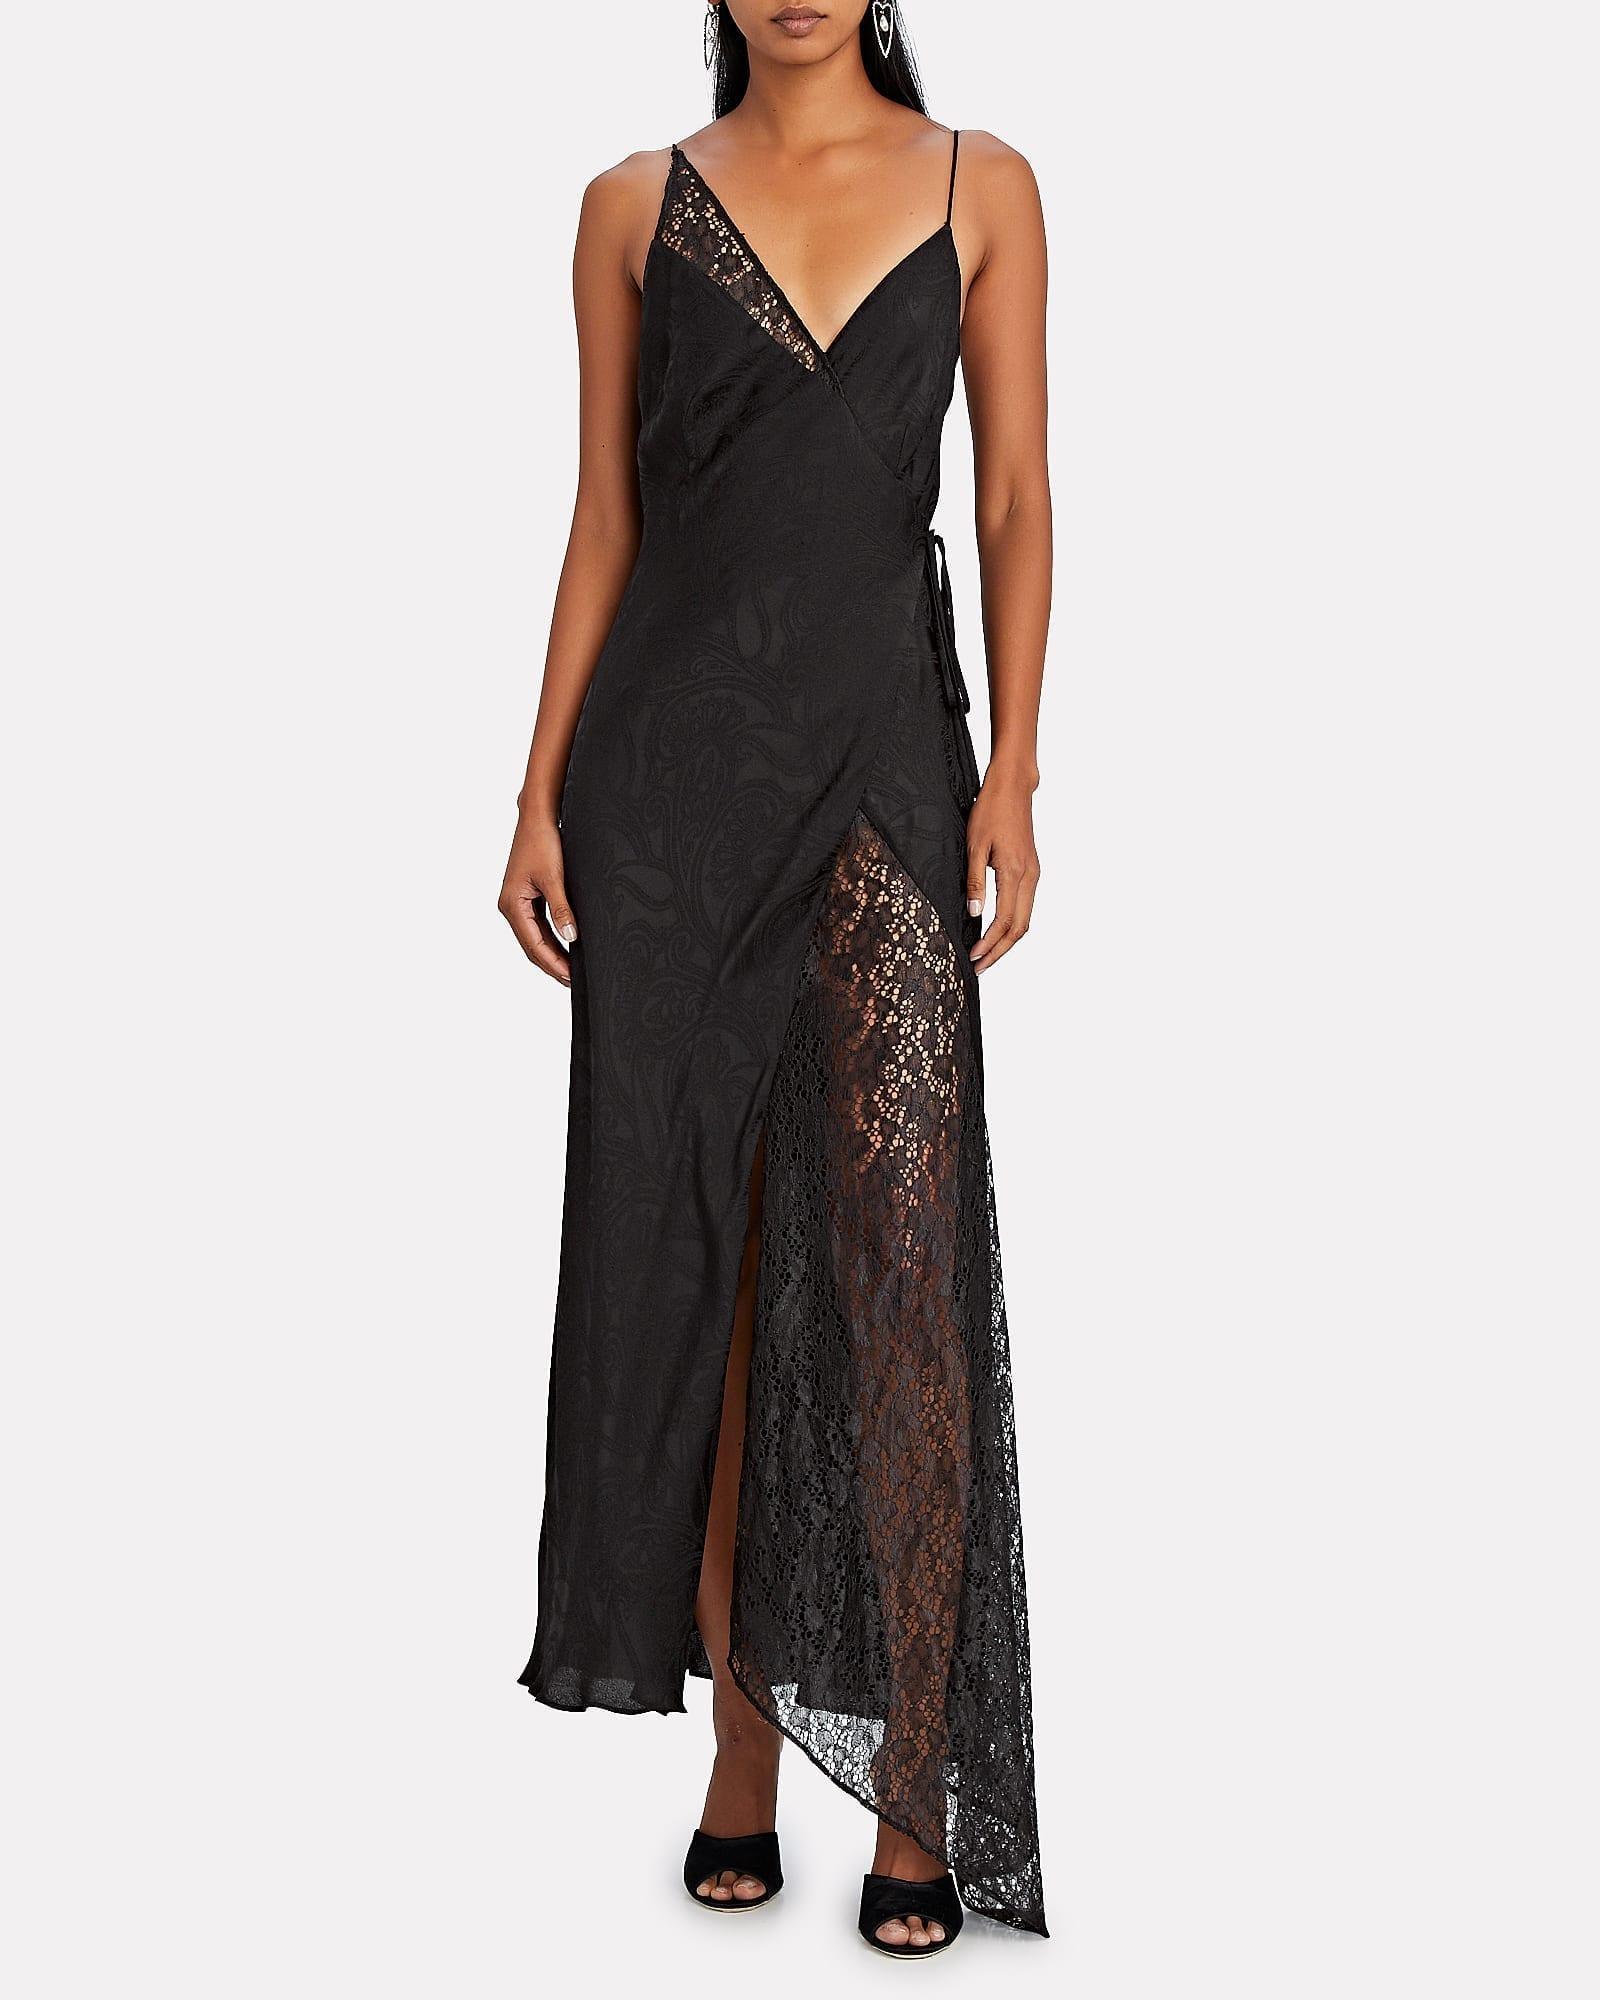 AMUR Evonne Asymmetrical Lace Slip Dress